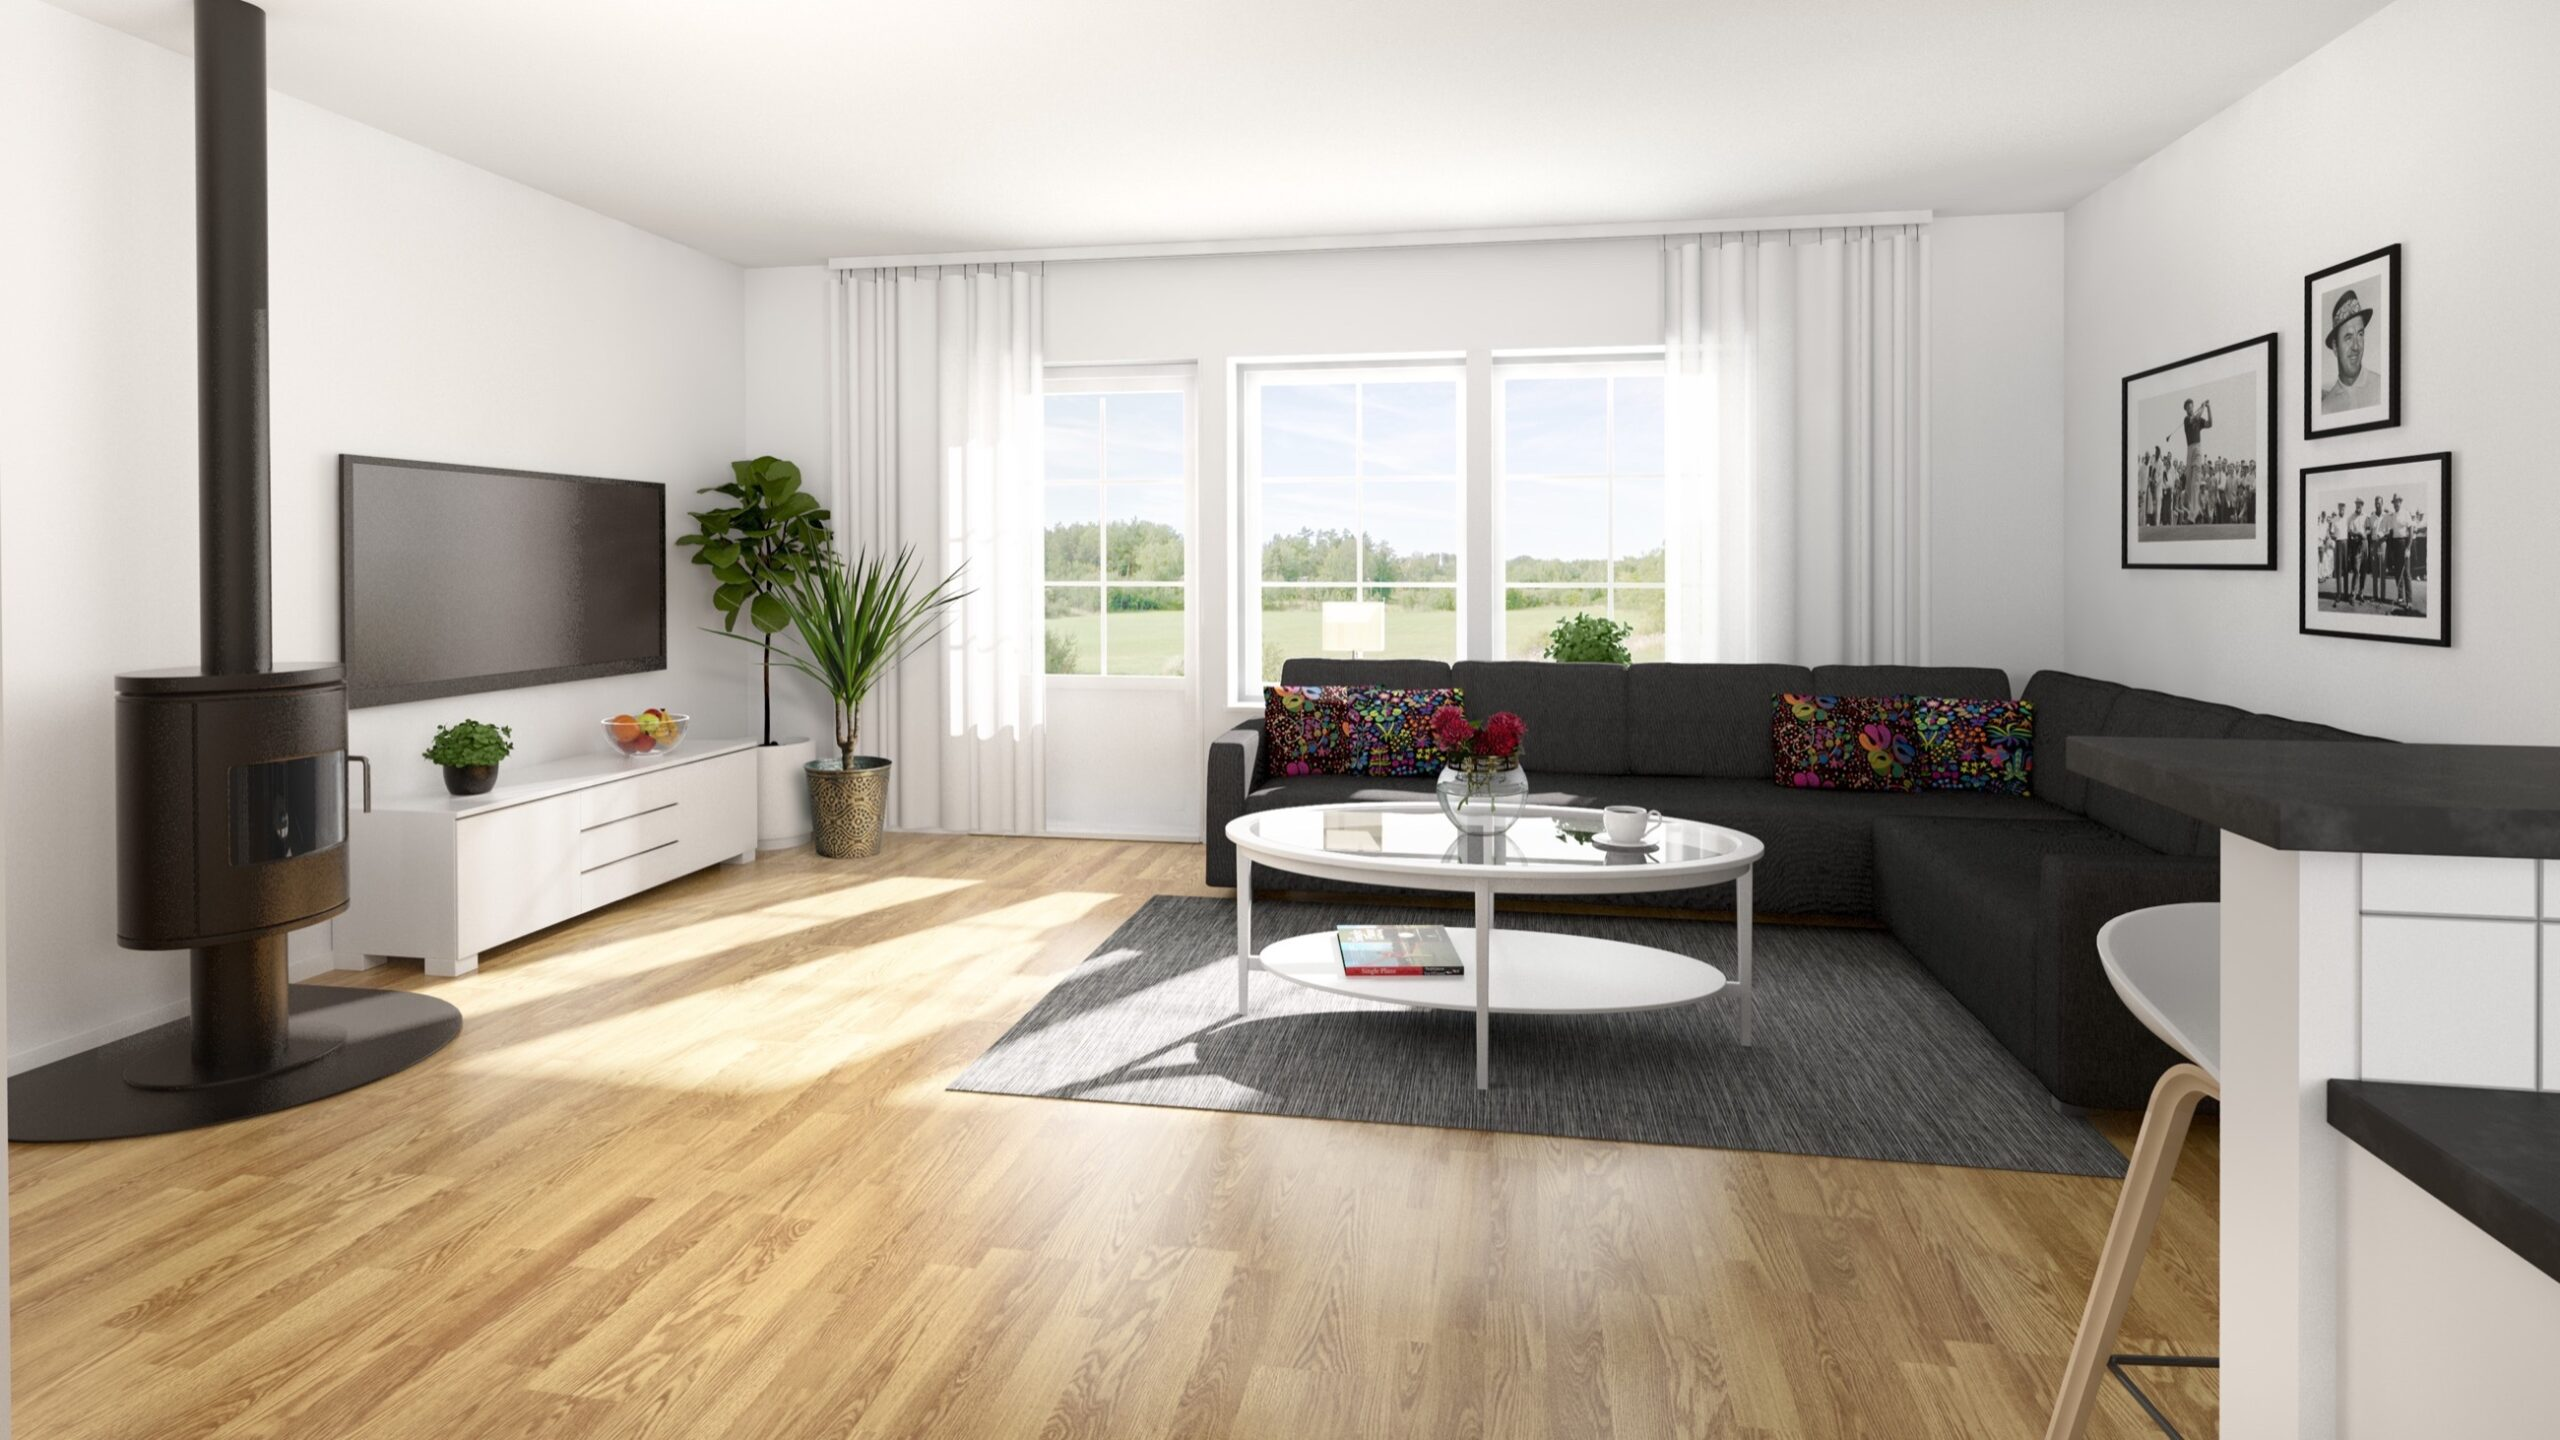 visualisering-interior-vardagsrum-laj-illustration